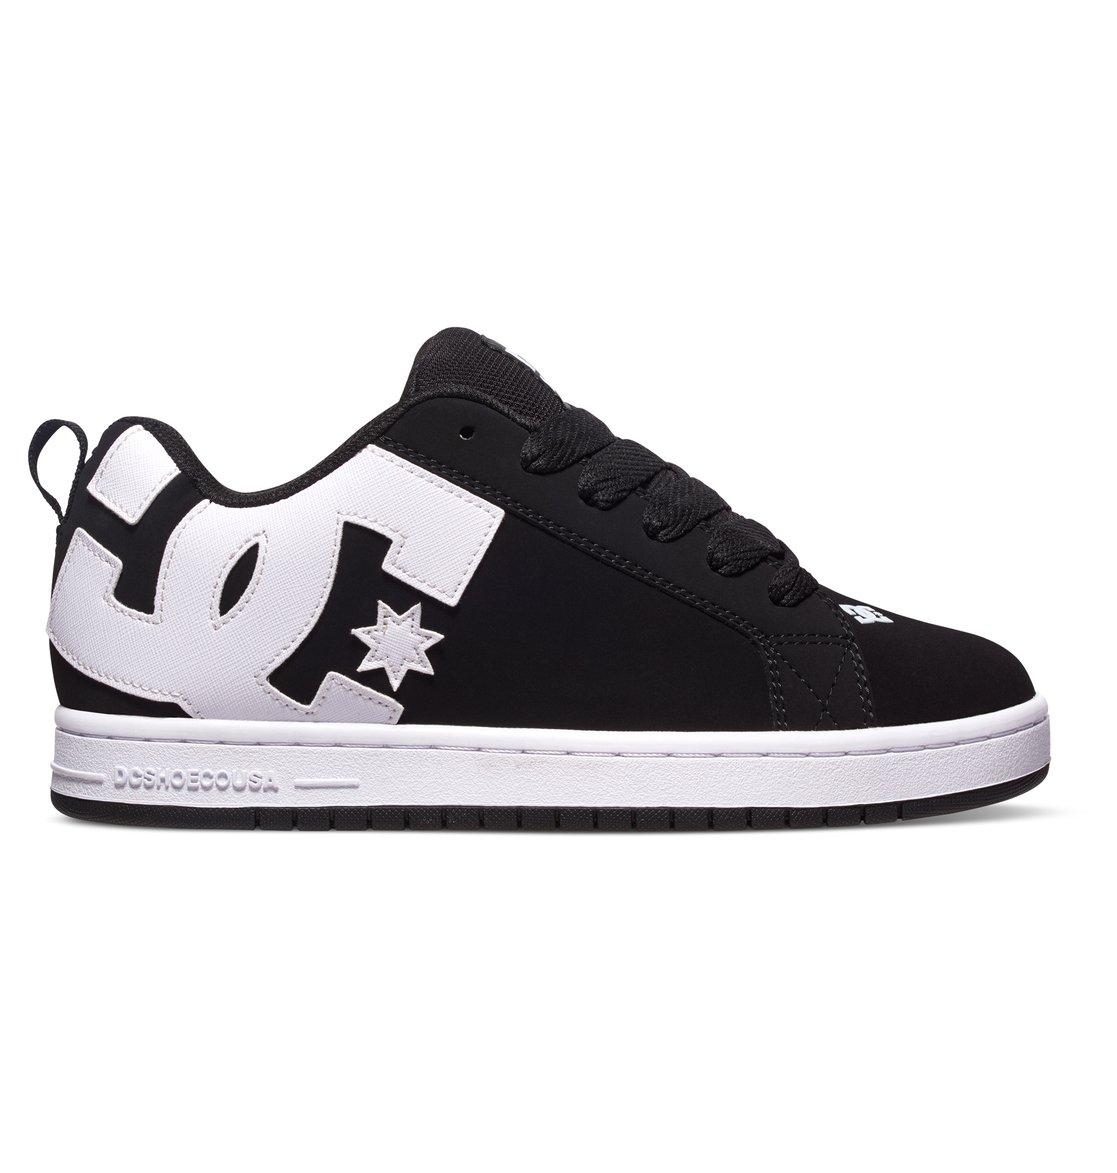 Calzado deportivo para hombre, color Negro , marca DC, modelo Calzado Deportivo Para Hombre DC PLAYER SE Negro